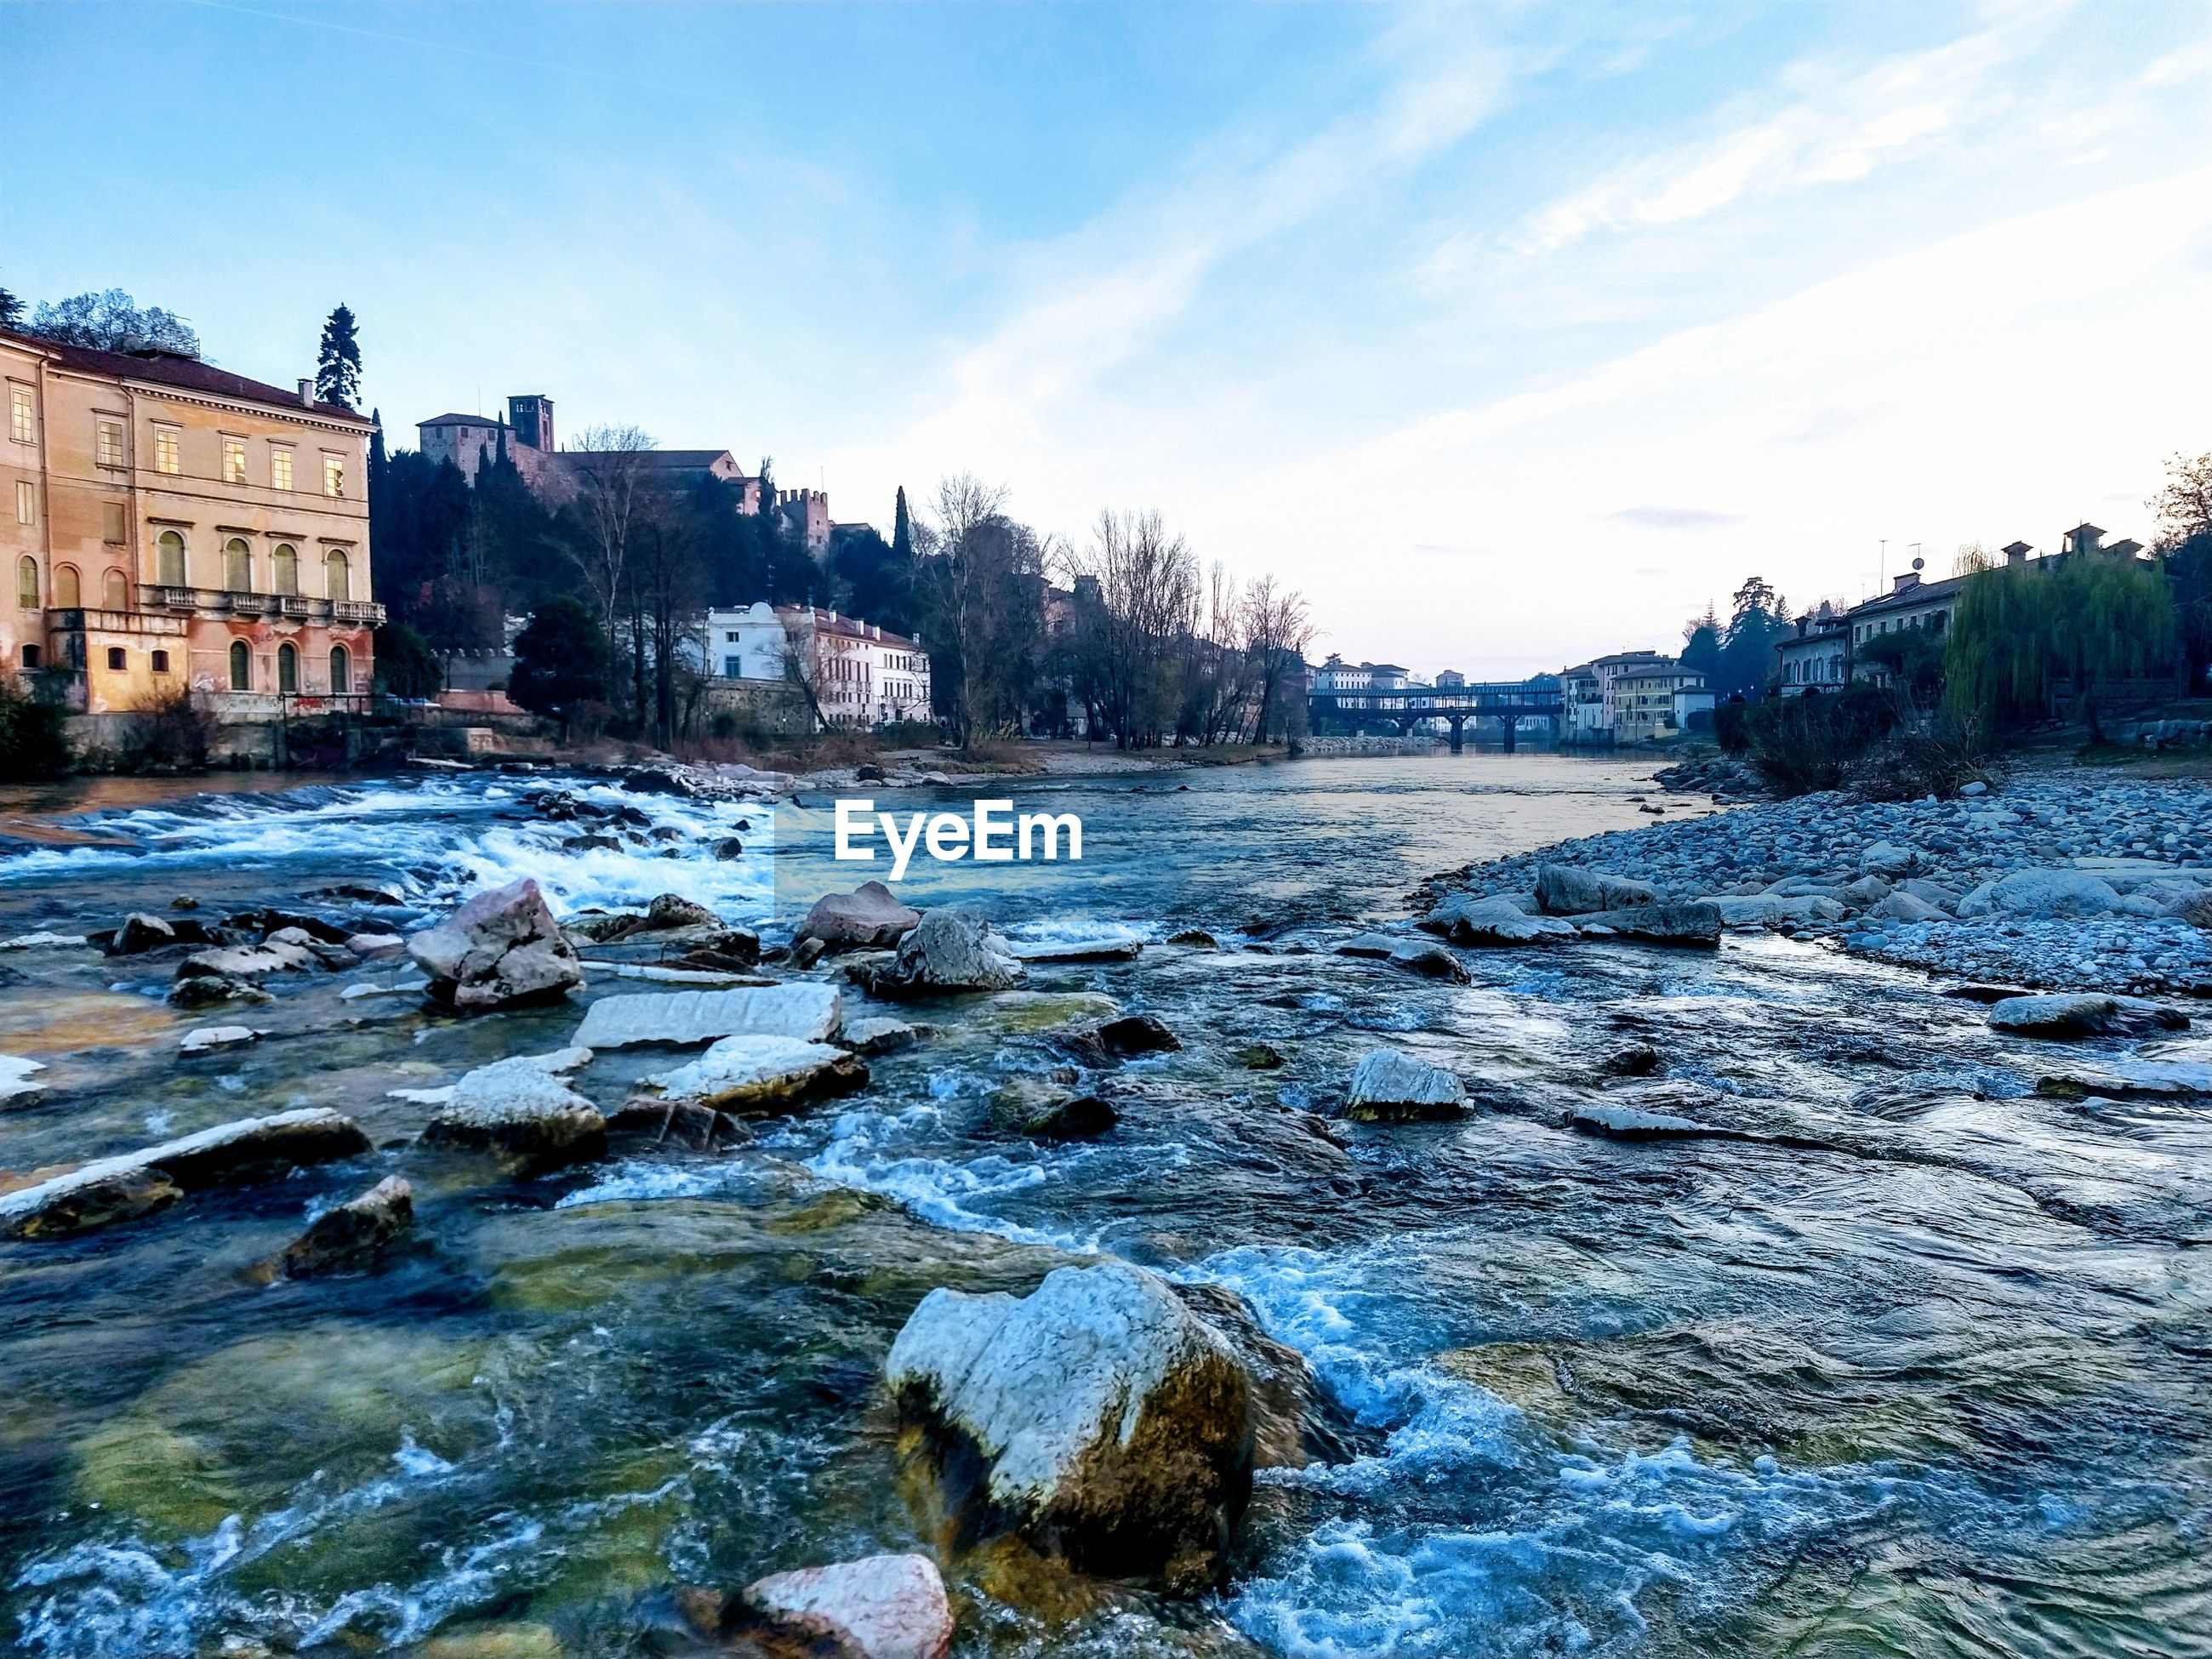 RIVER FLOWING BY ROCKS AGAINST SKY